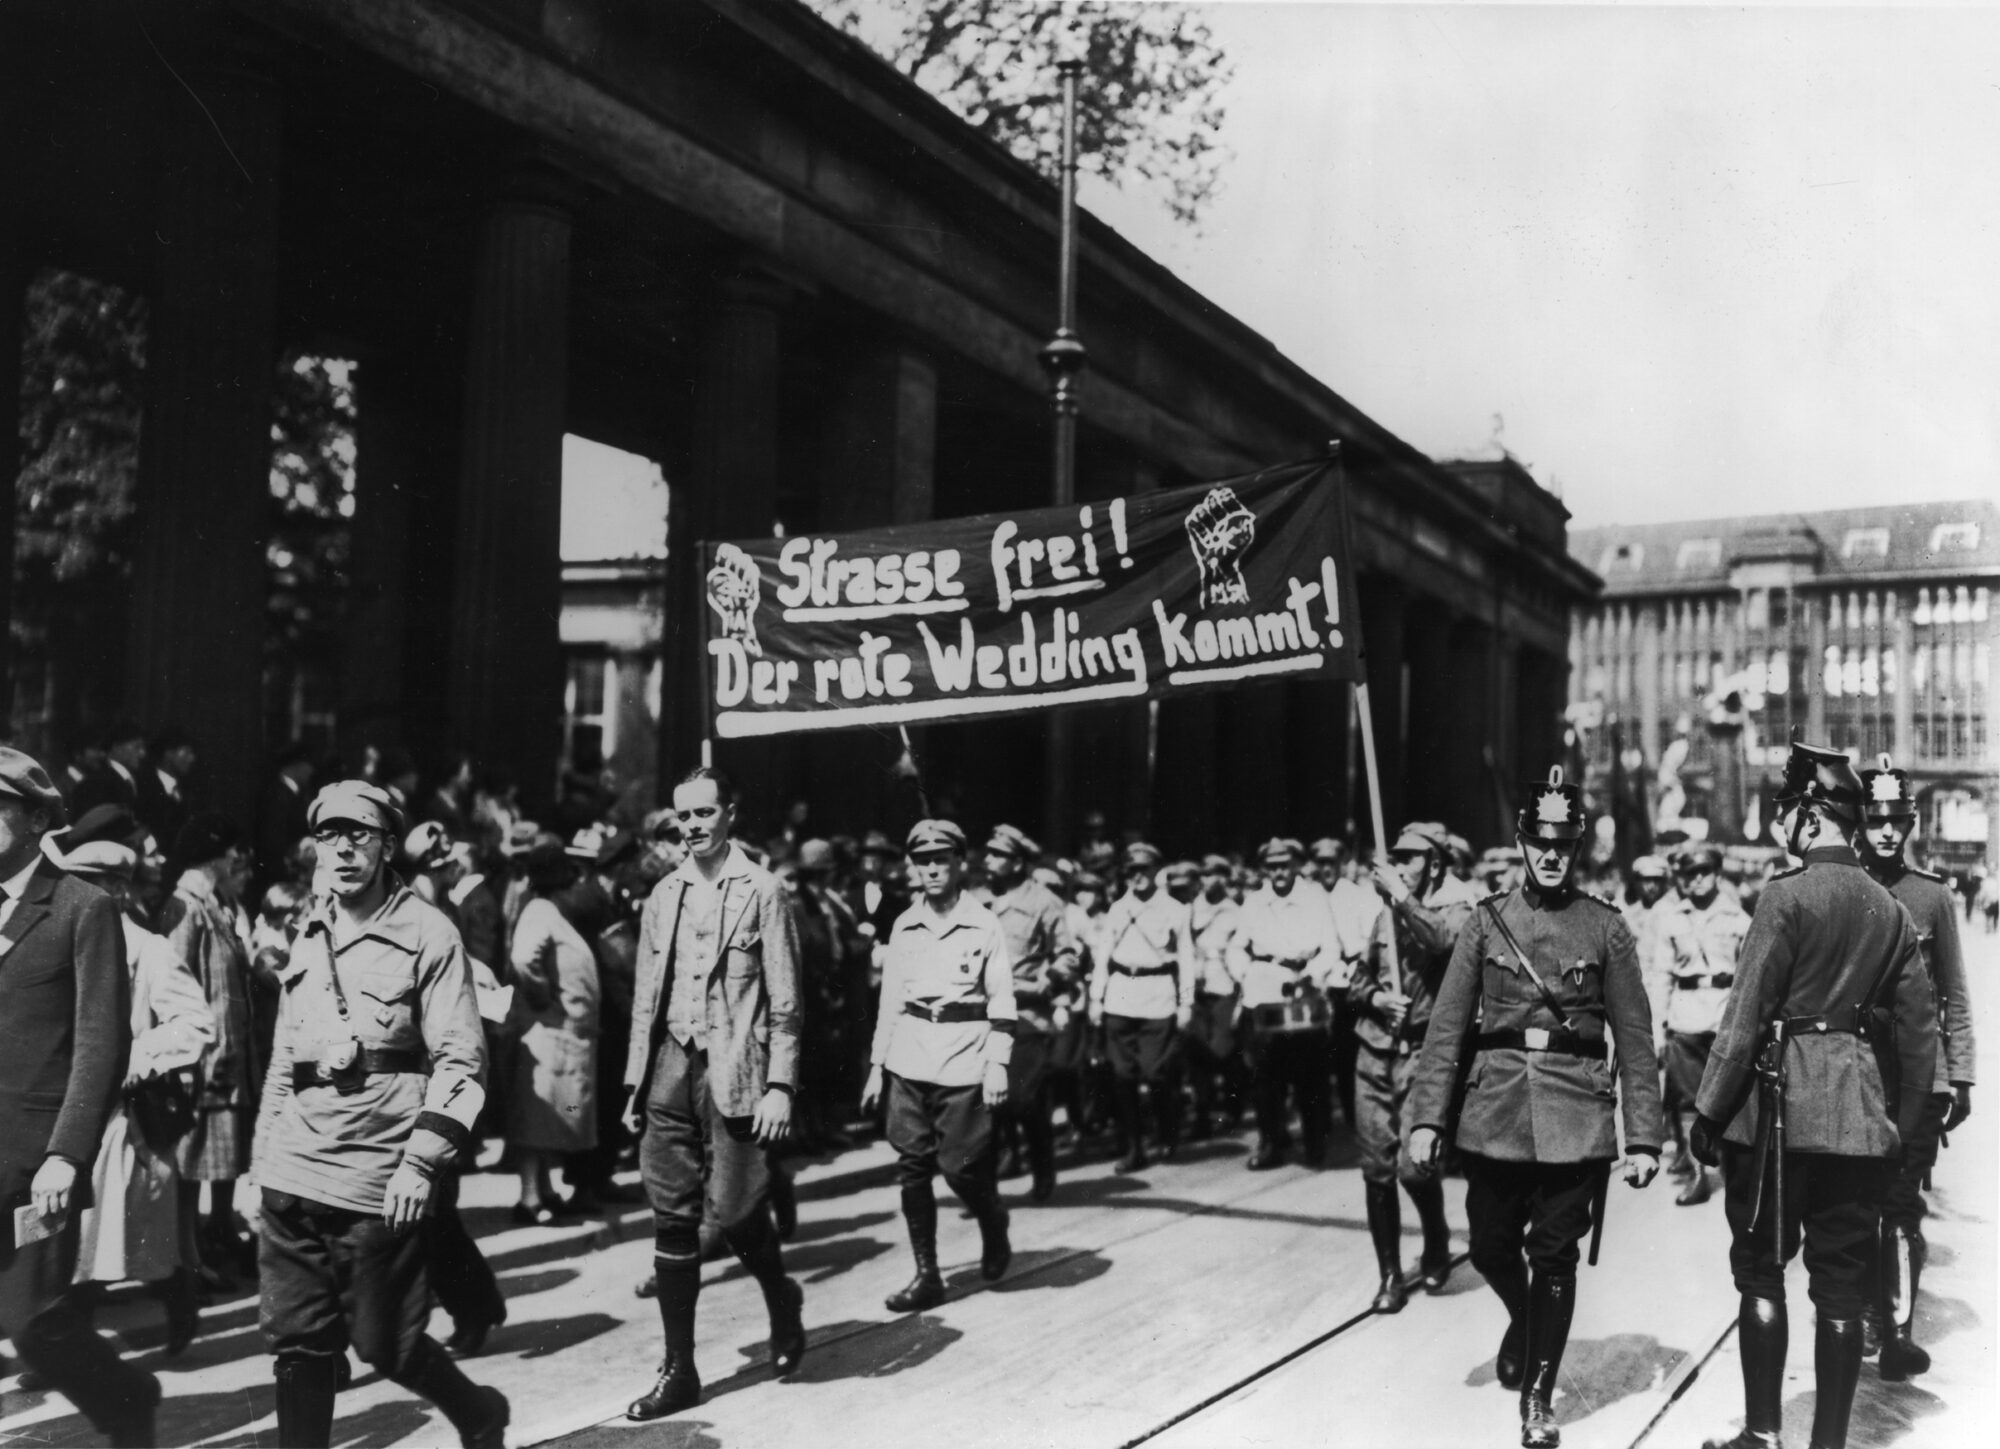 """Straße frei ! Der Rote Wedding kommt !"" - Demonstration der KPD in Berlin am 1. Mai 1929; Landesarchiv Berlin. Foto: Fotograf unbekannt;"